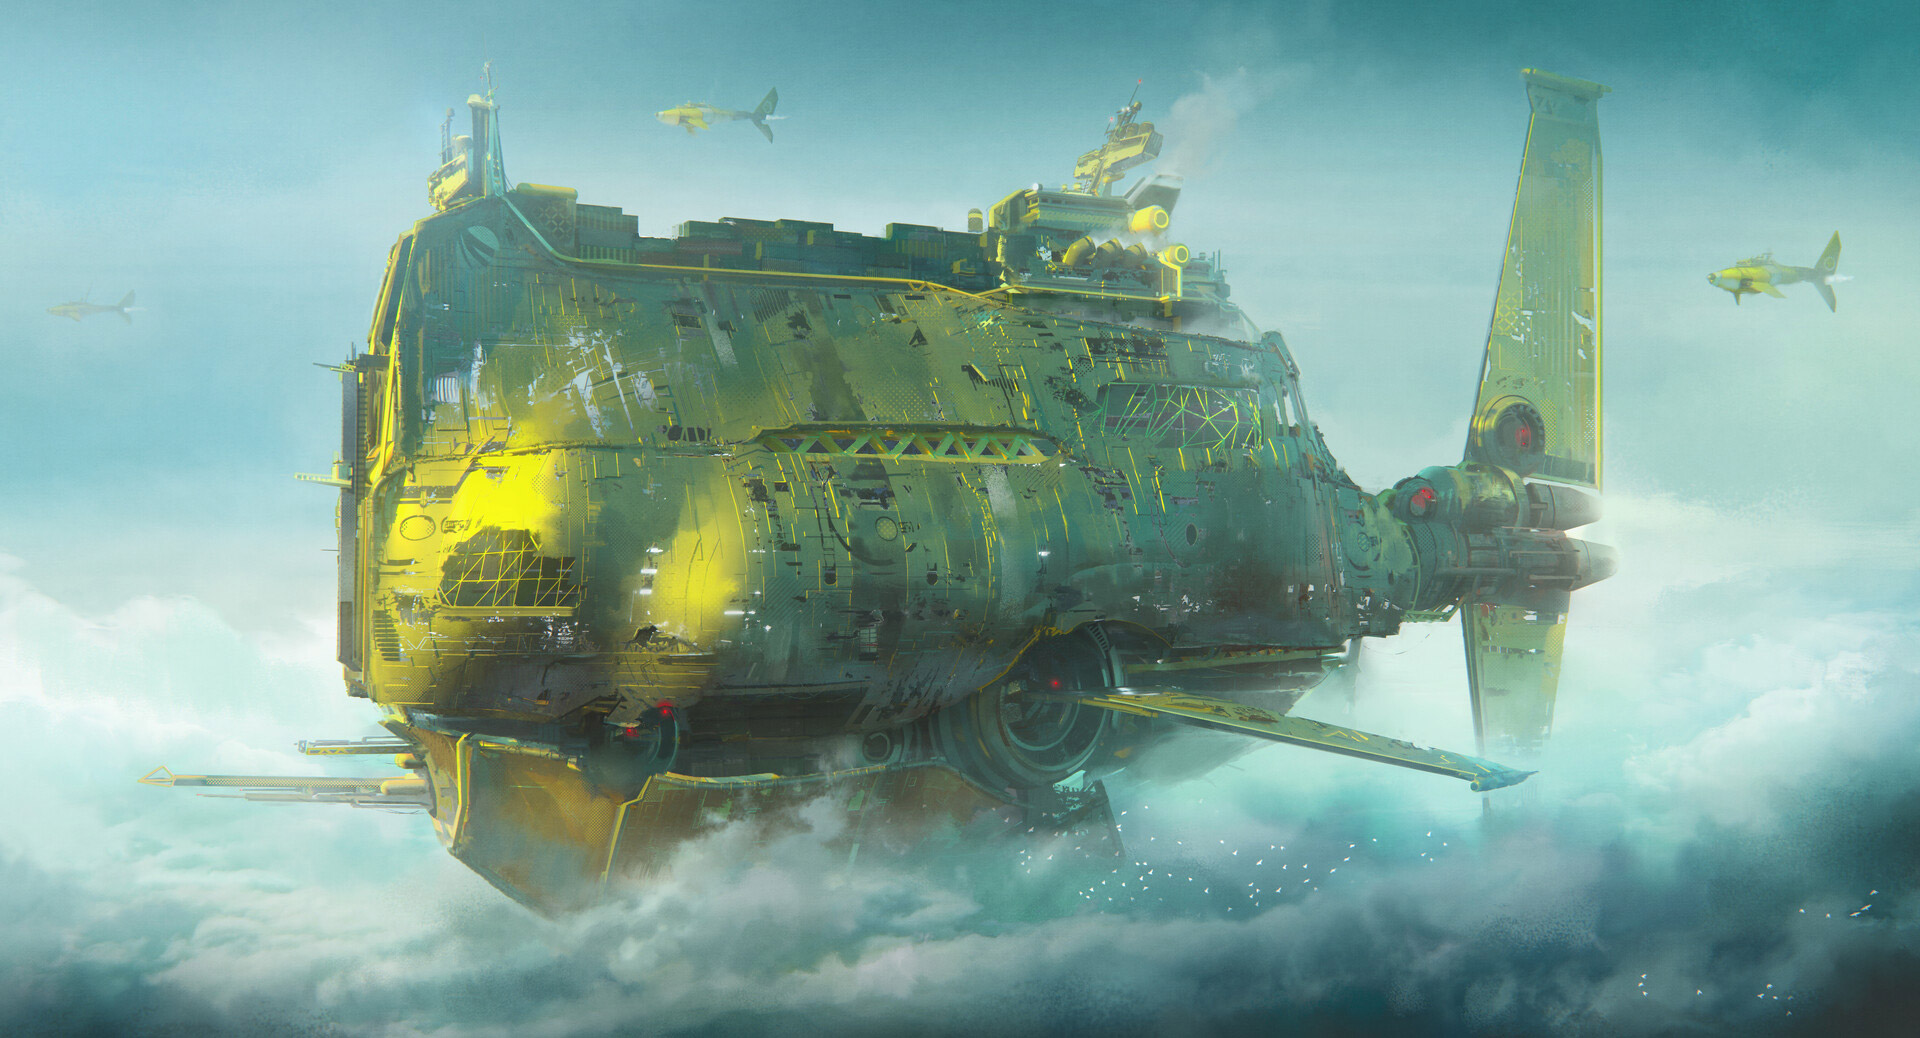 The Sci-Fi Cityscapes of Leon Tukker